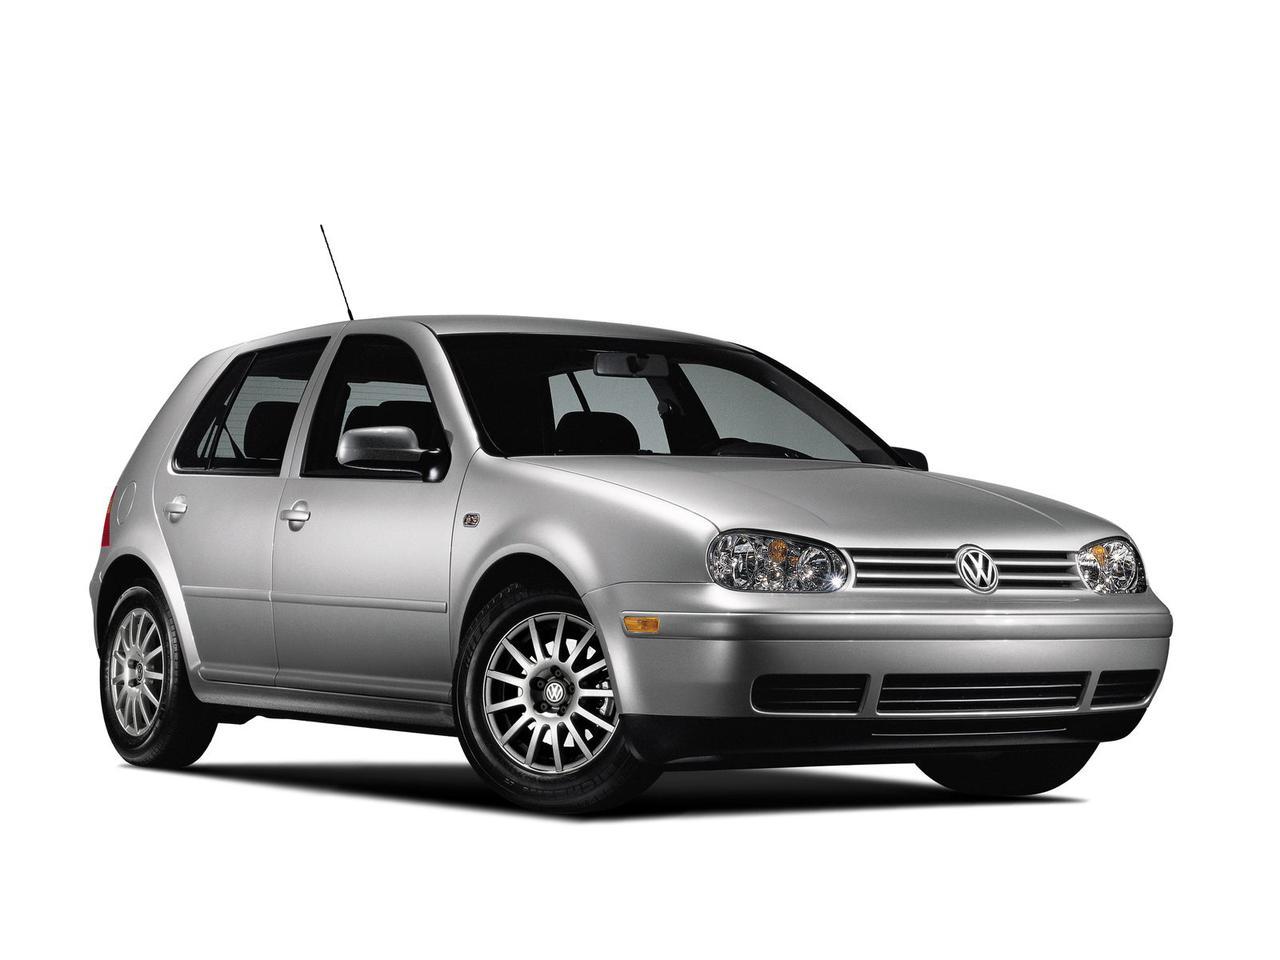 Лобовое стекло Volkswagen Golf 4 (1997-2003)